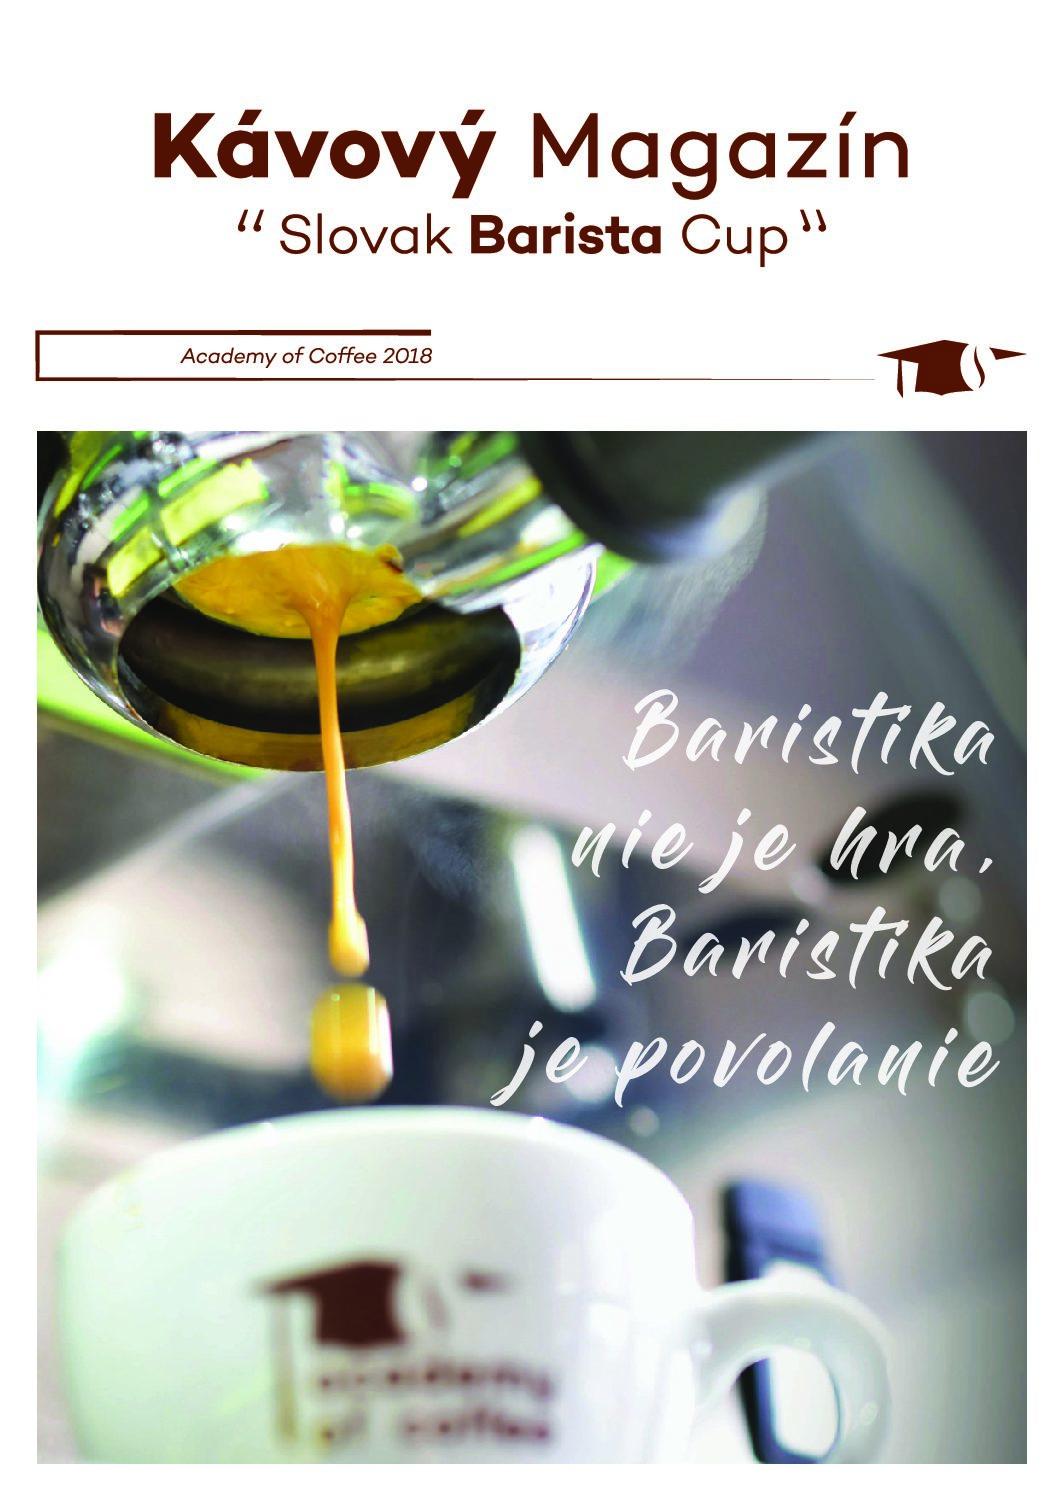 Kavovy Magazin 1 pdf